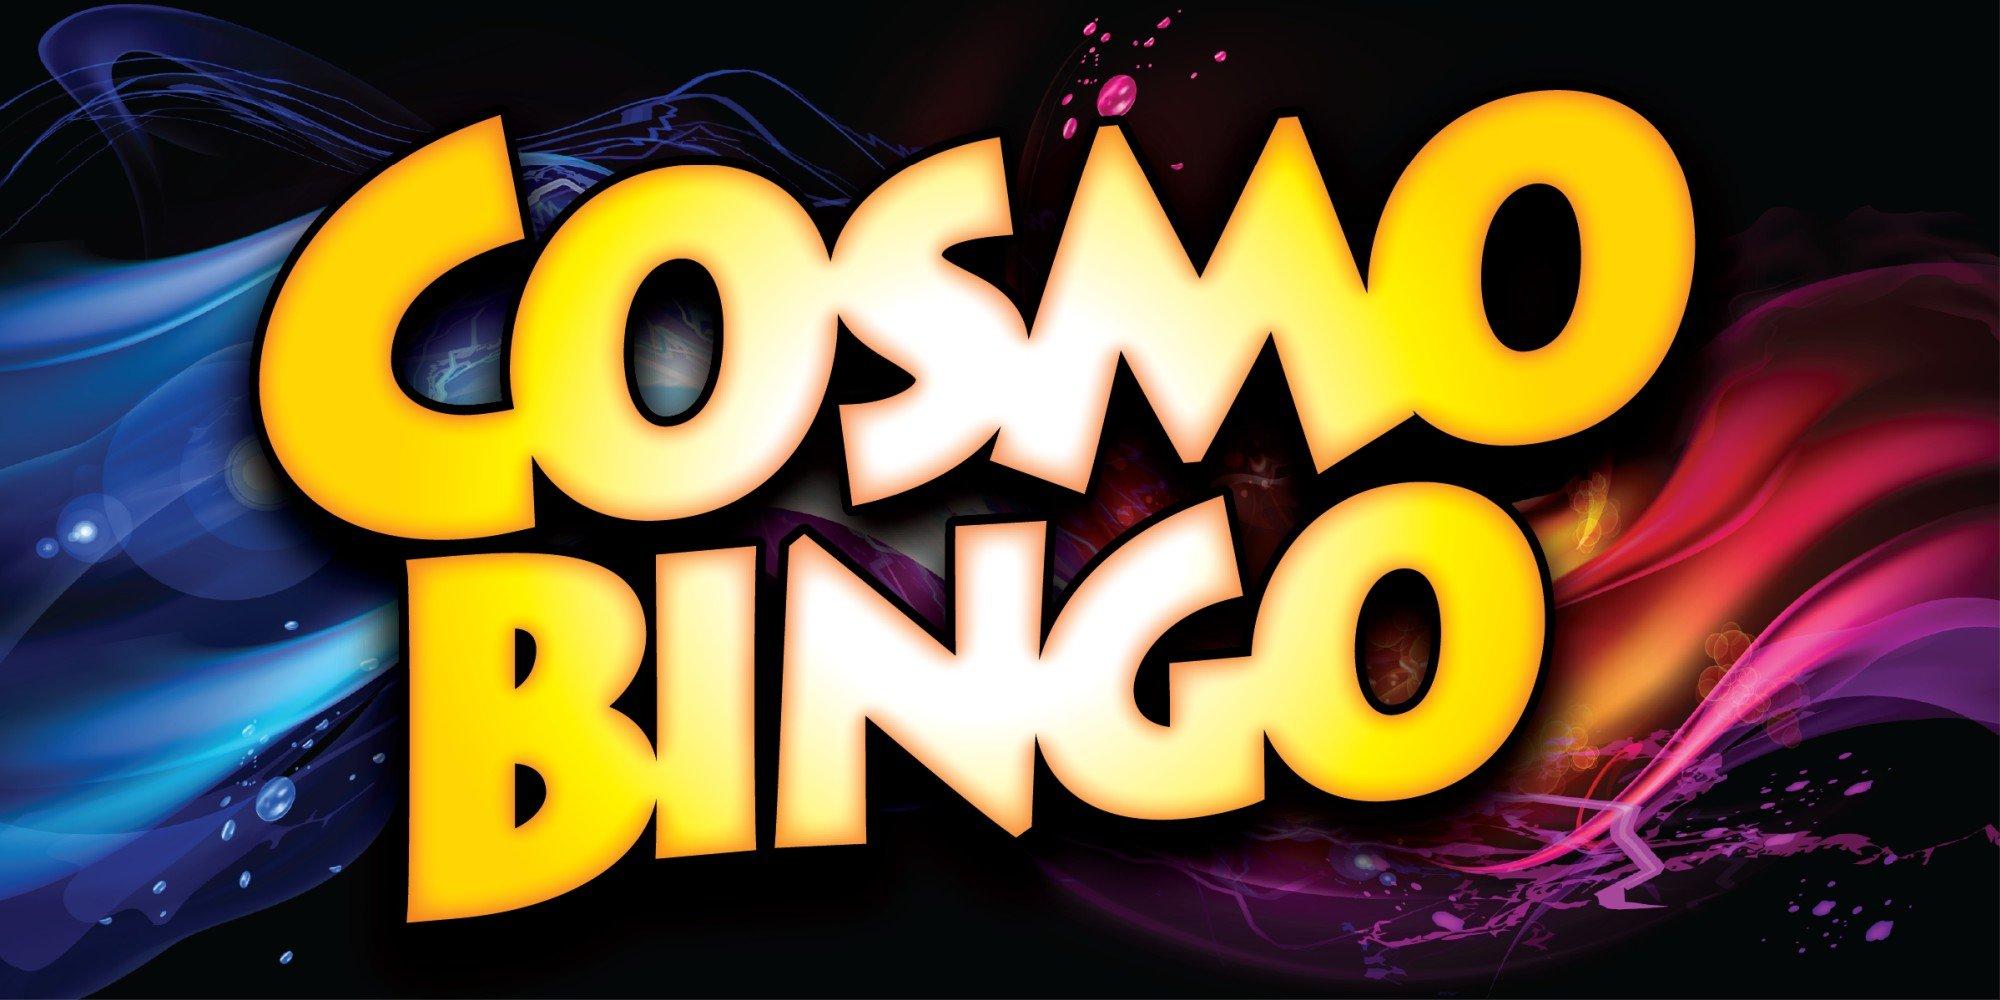 Web Header Promotion-January Cosmo Bingo